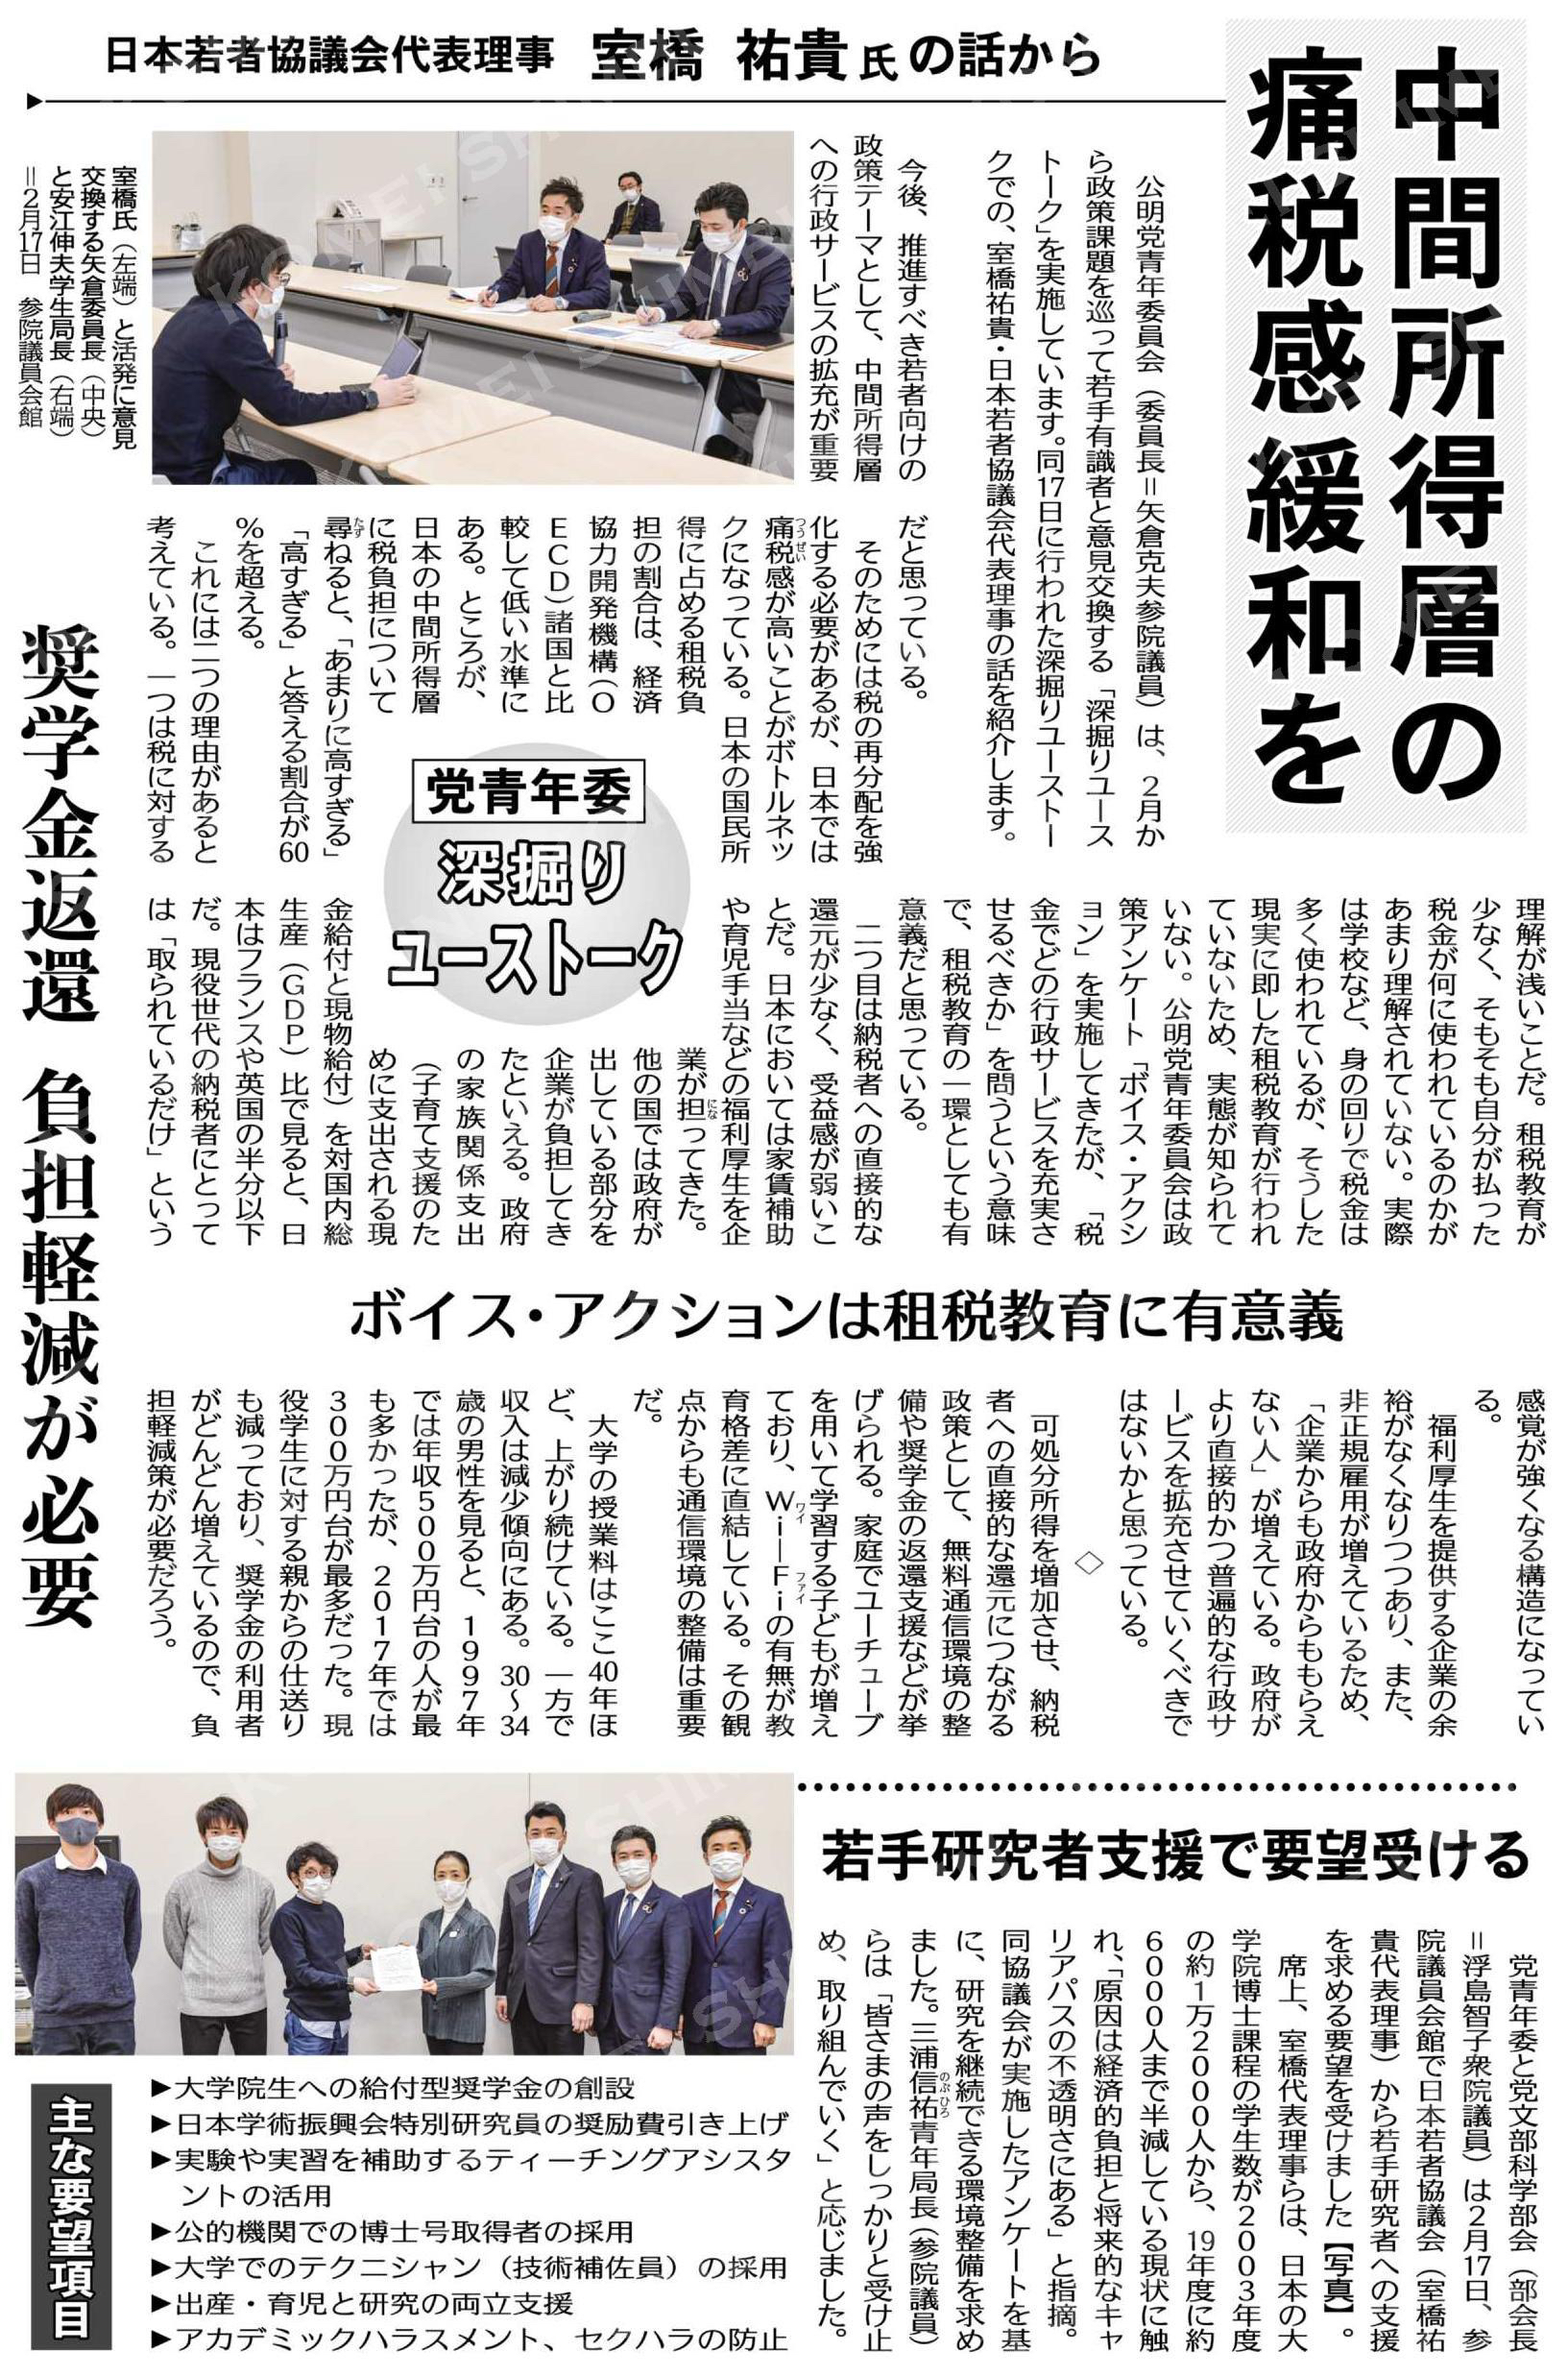 (KOMEI@ 党青年委の深掘りユーストーク)中間所得層の痛税感緩和を/日本若者協議会代表理事・室橋祐貴氏の話から